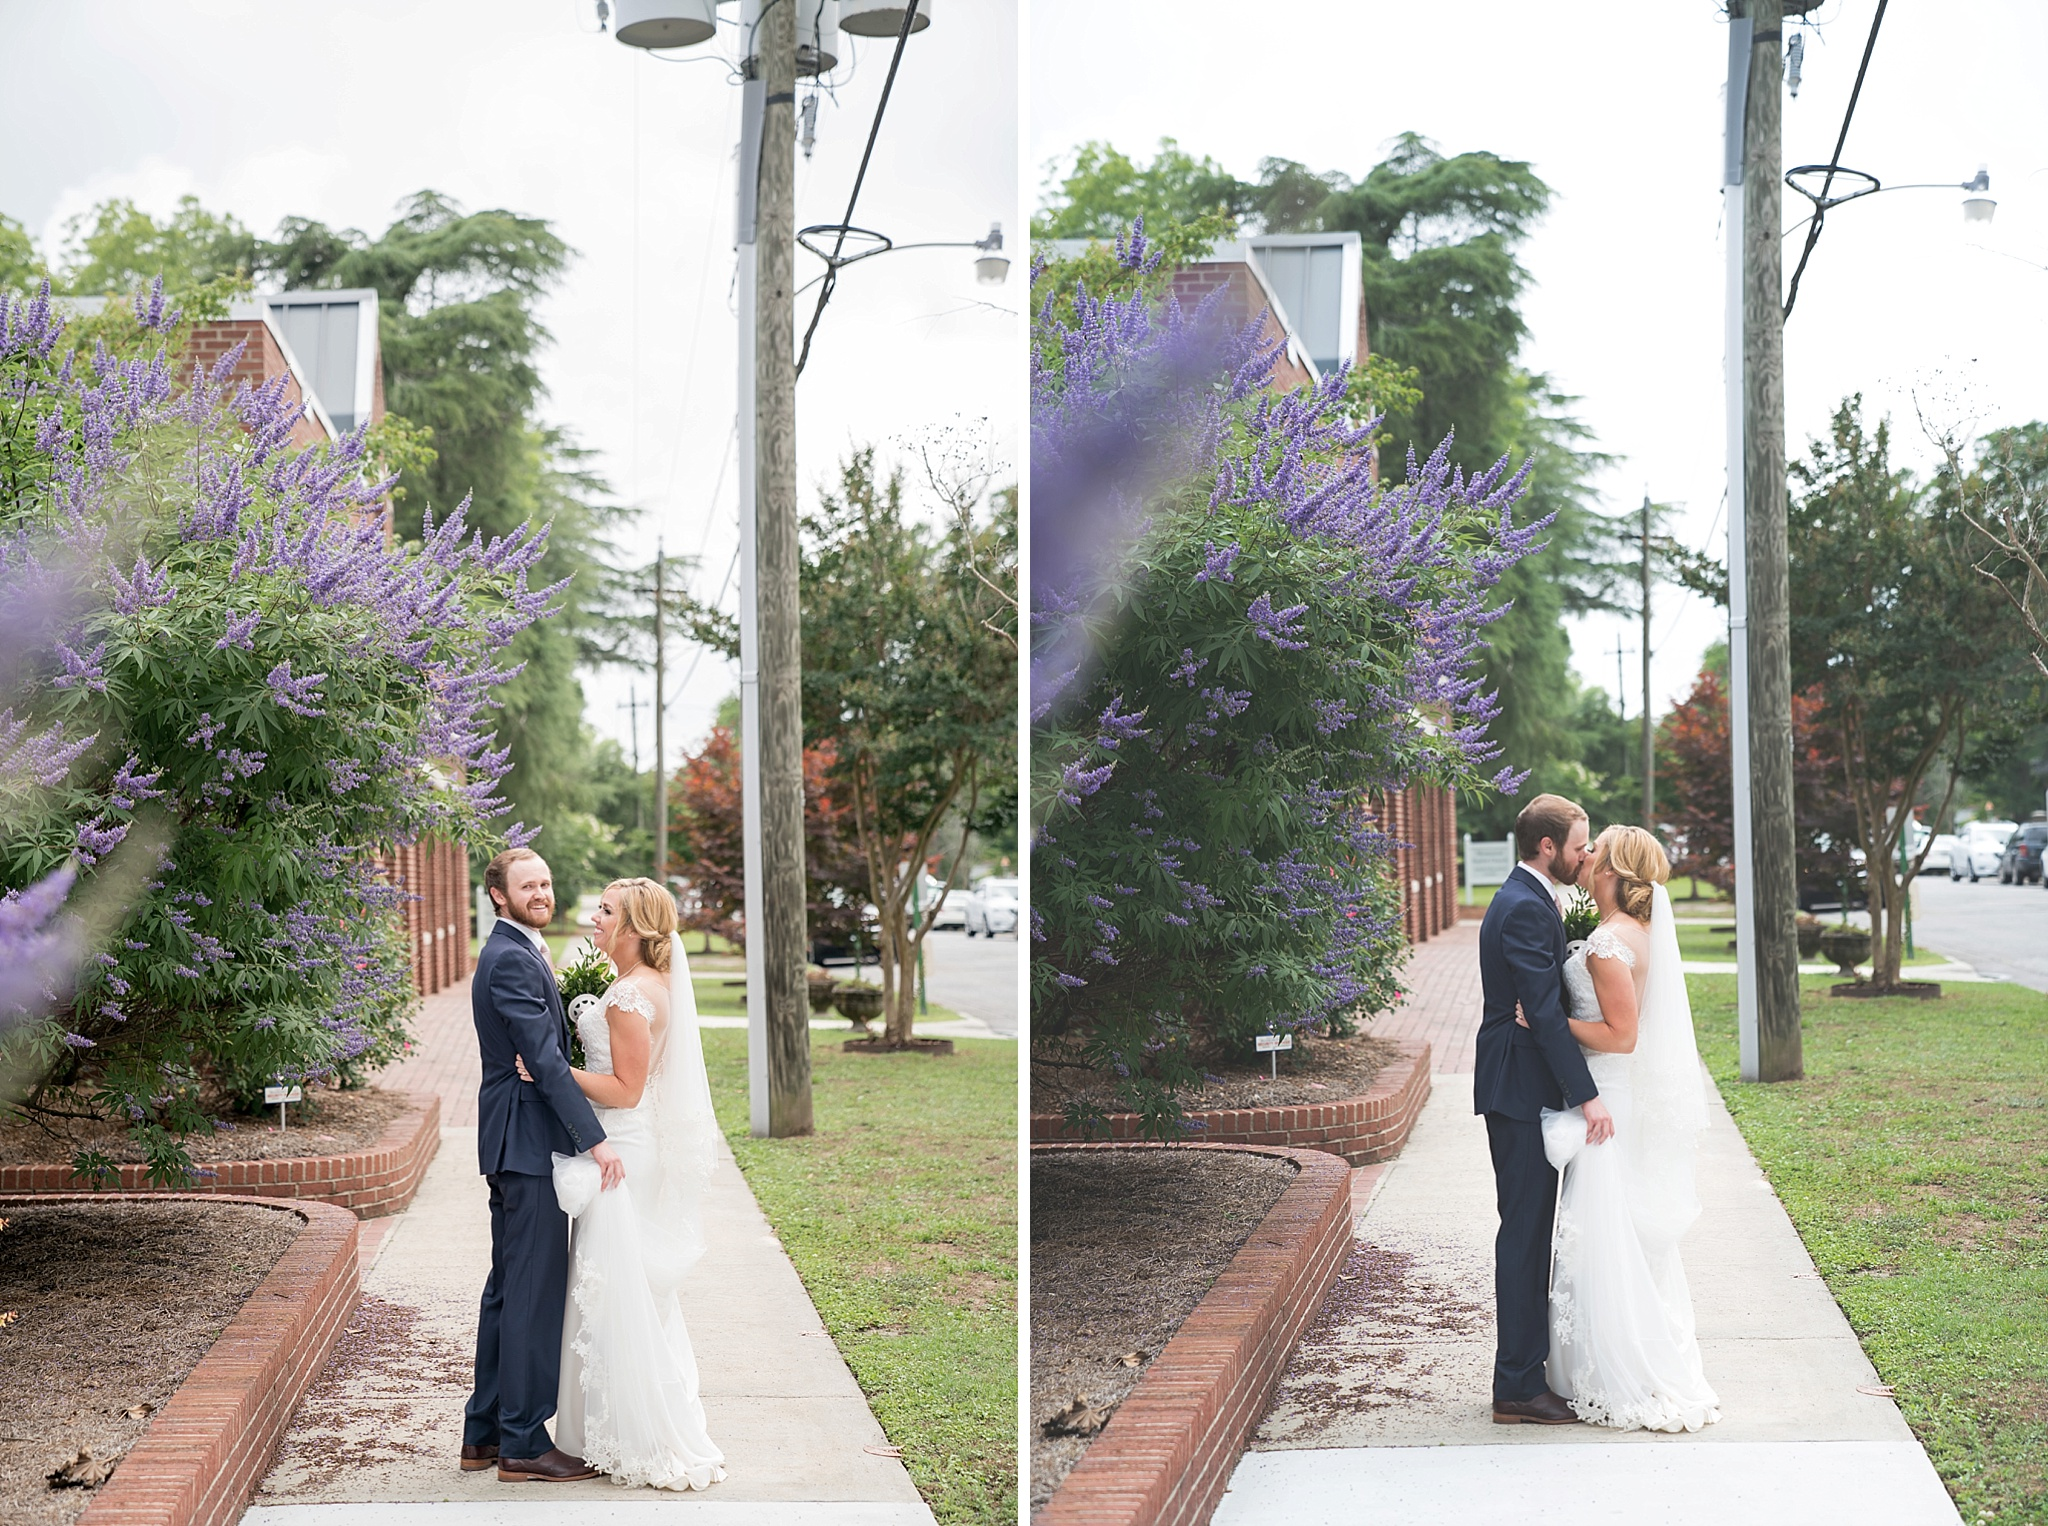 Williamston-NC-Wedding-Photographer-021.jpg